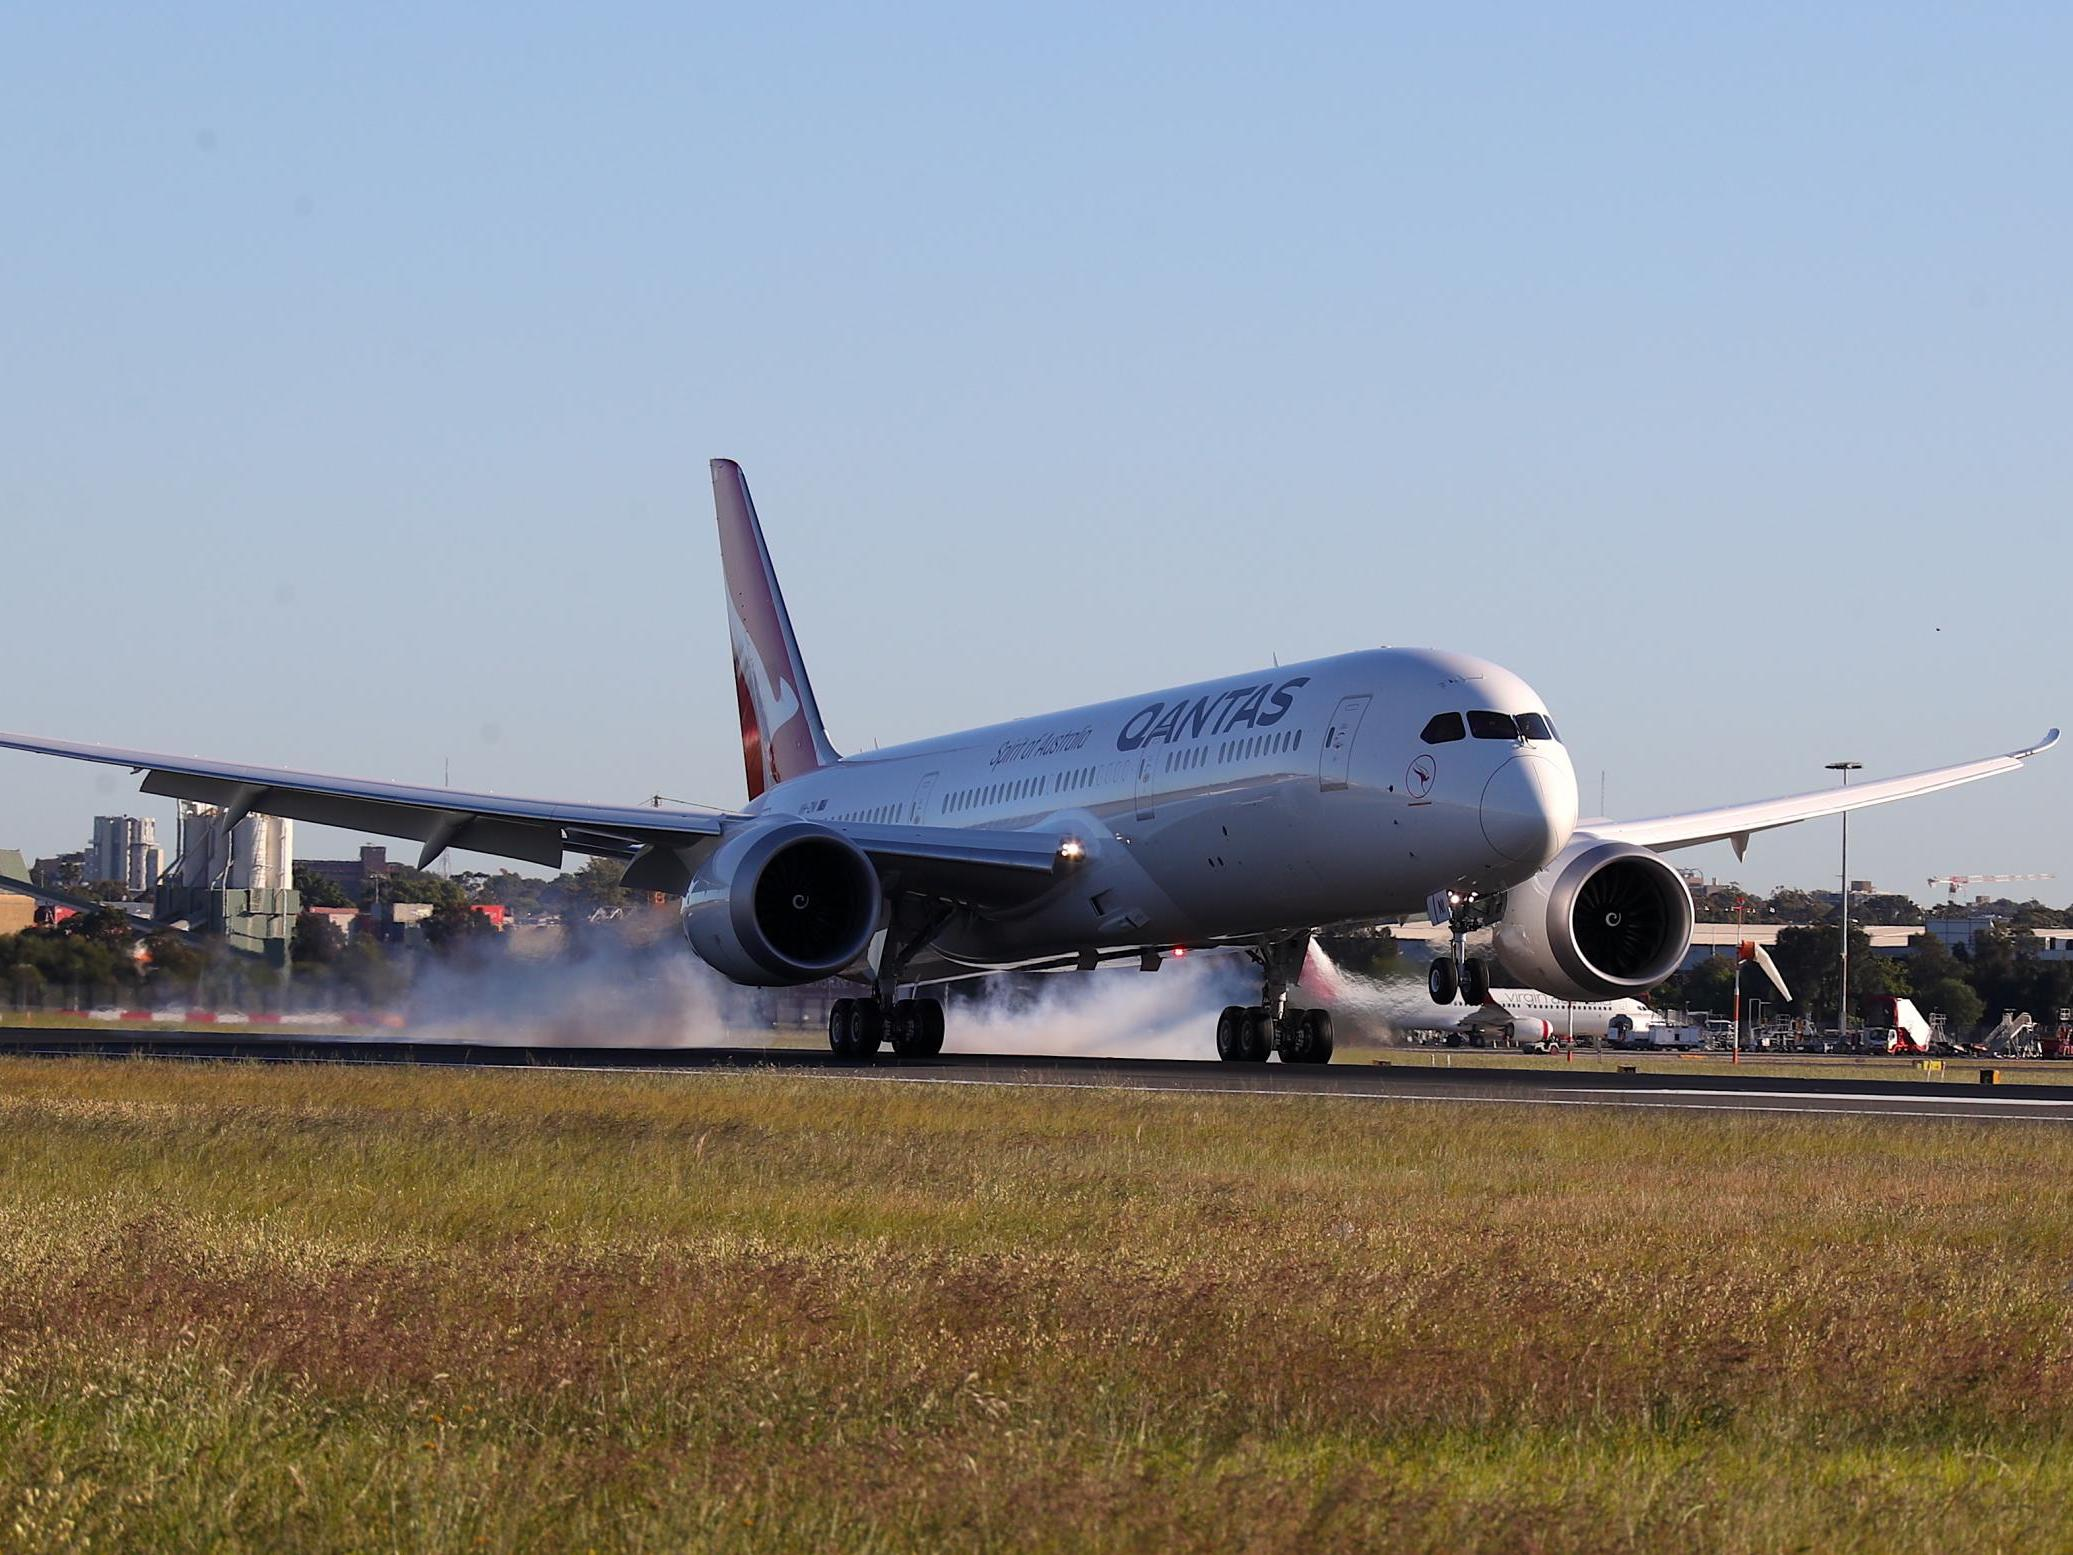 Qantas' London to Sydney flight – live: Almost empty plane flies direct as part of 'Project Sunrise'